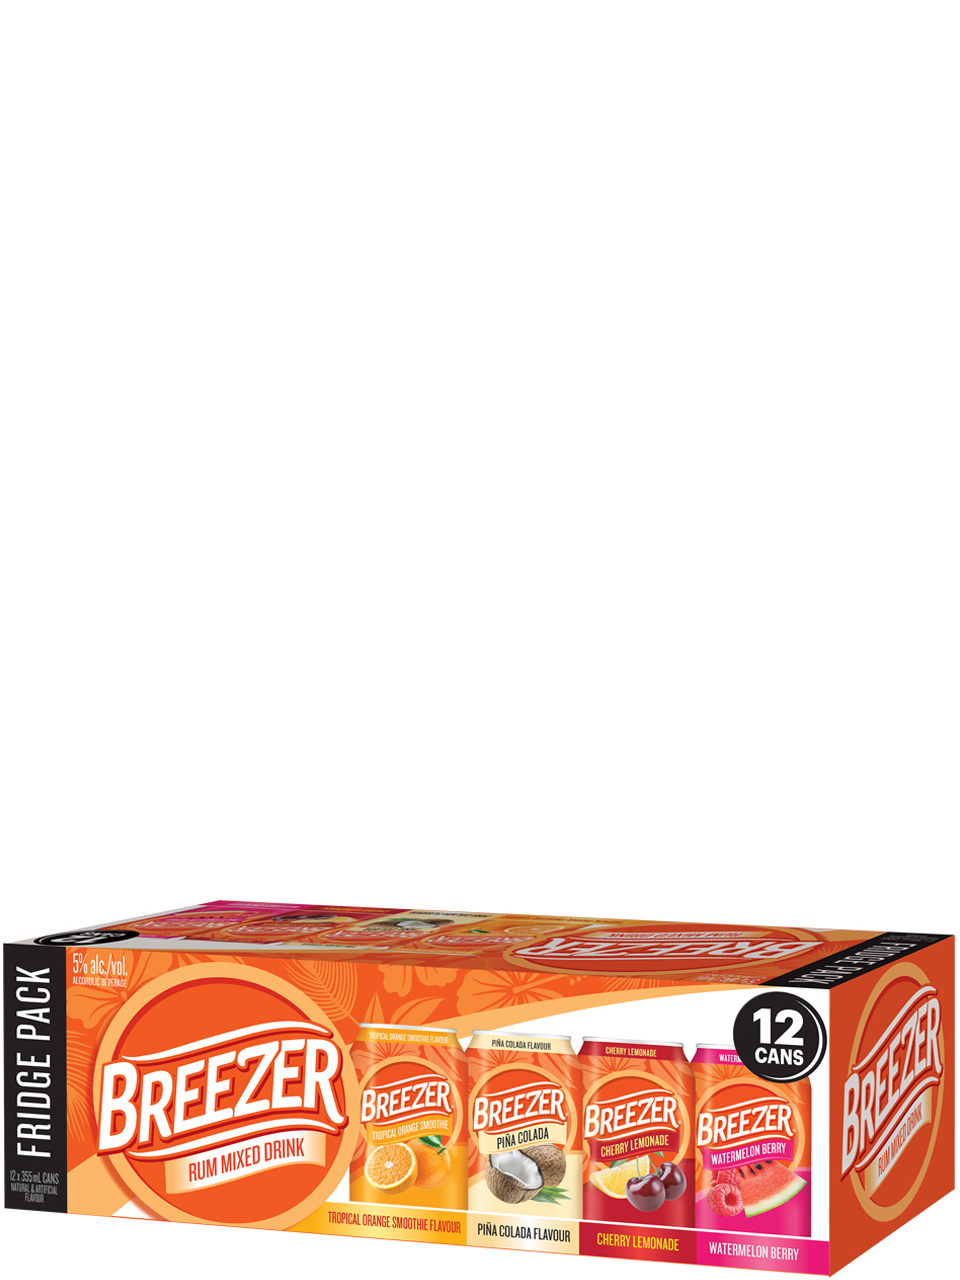 Breezer Fridge Pack 12 Pack Cans